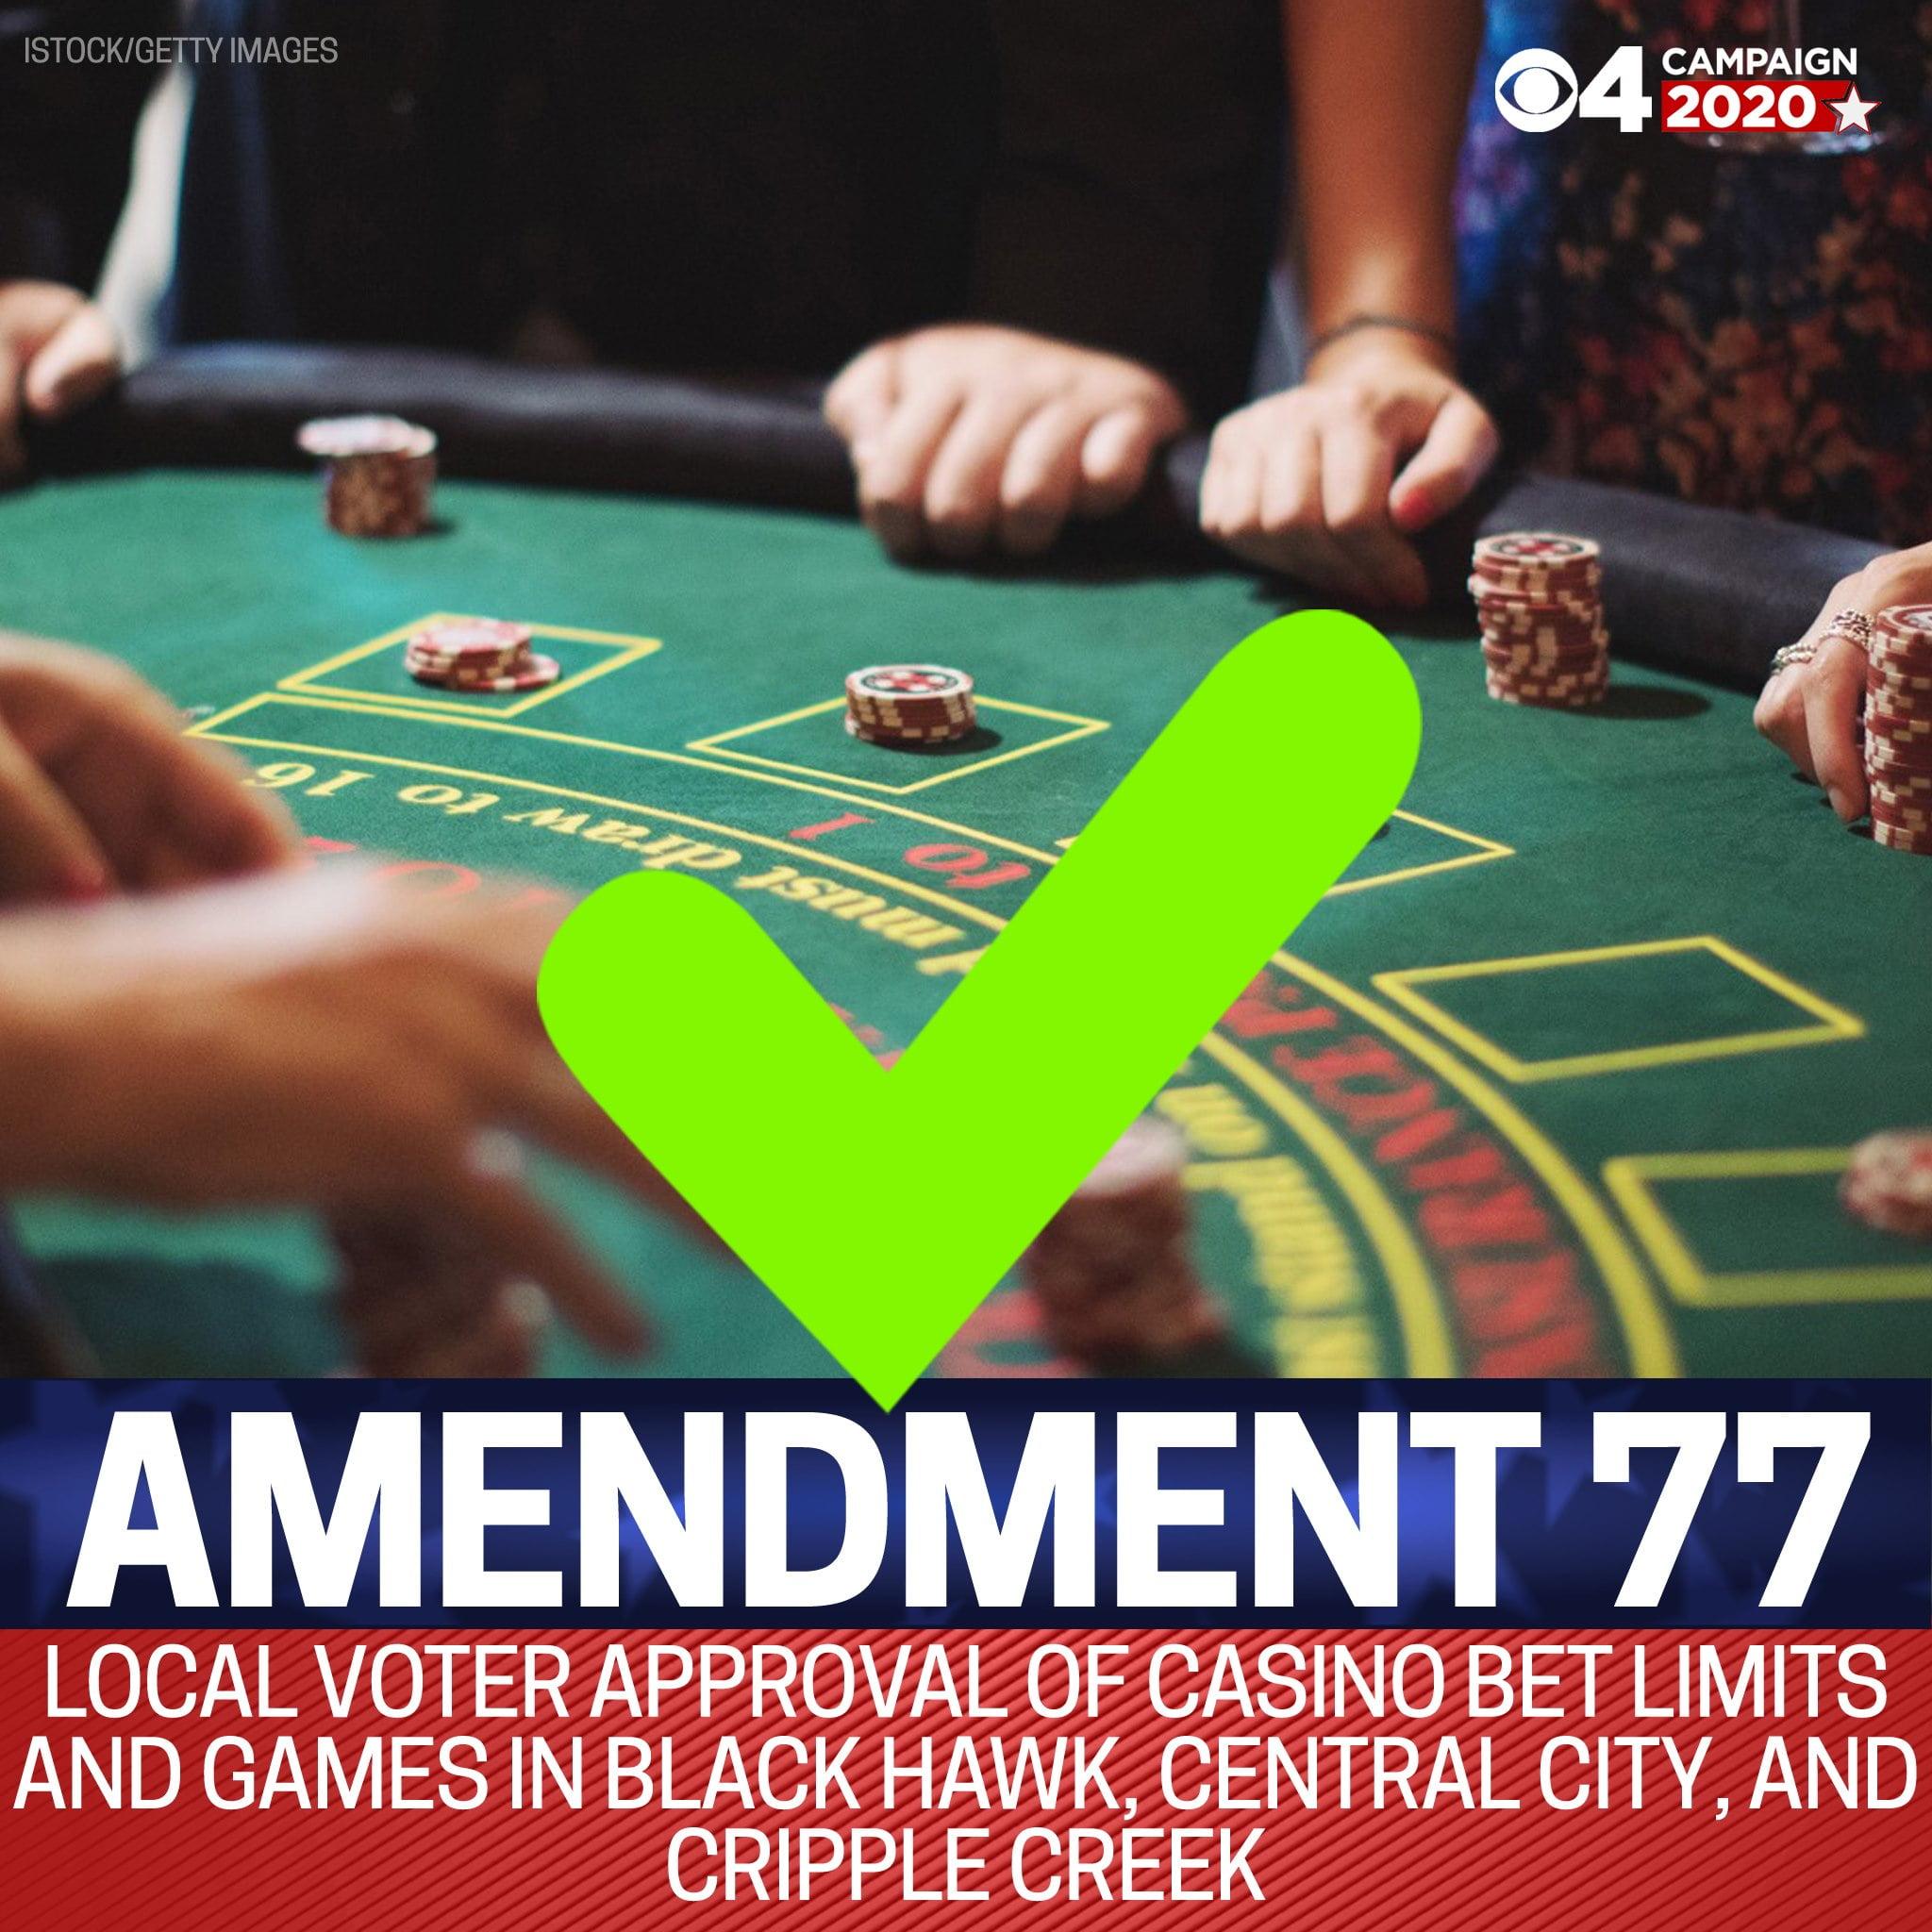 Monarch Casino Black Hawk Praise Amendment 77